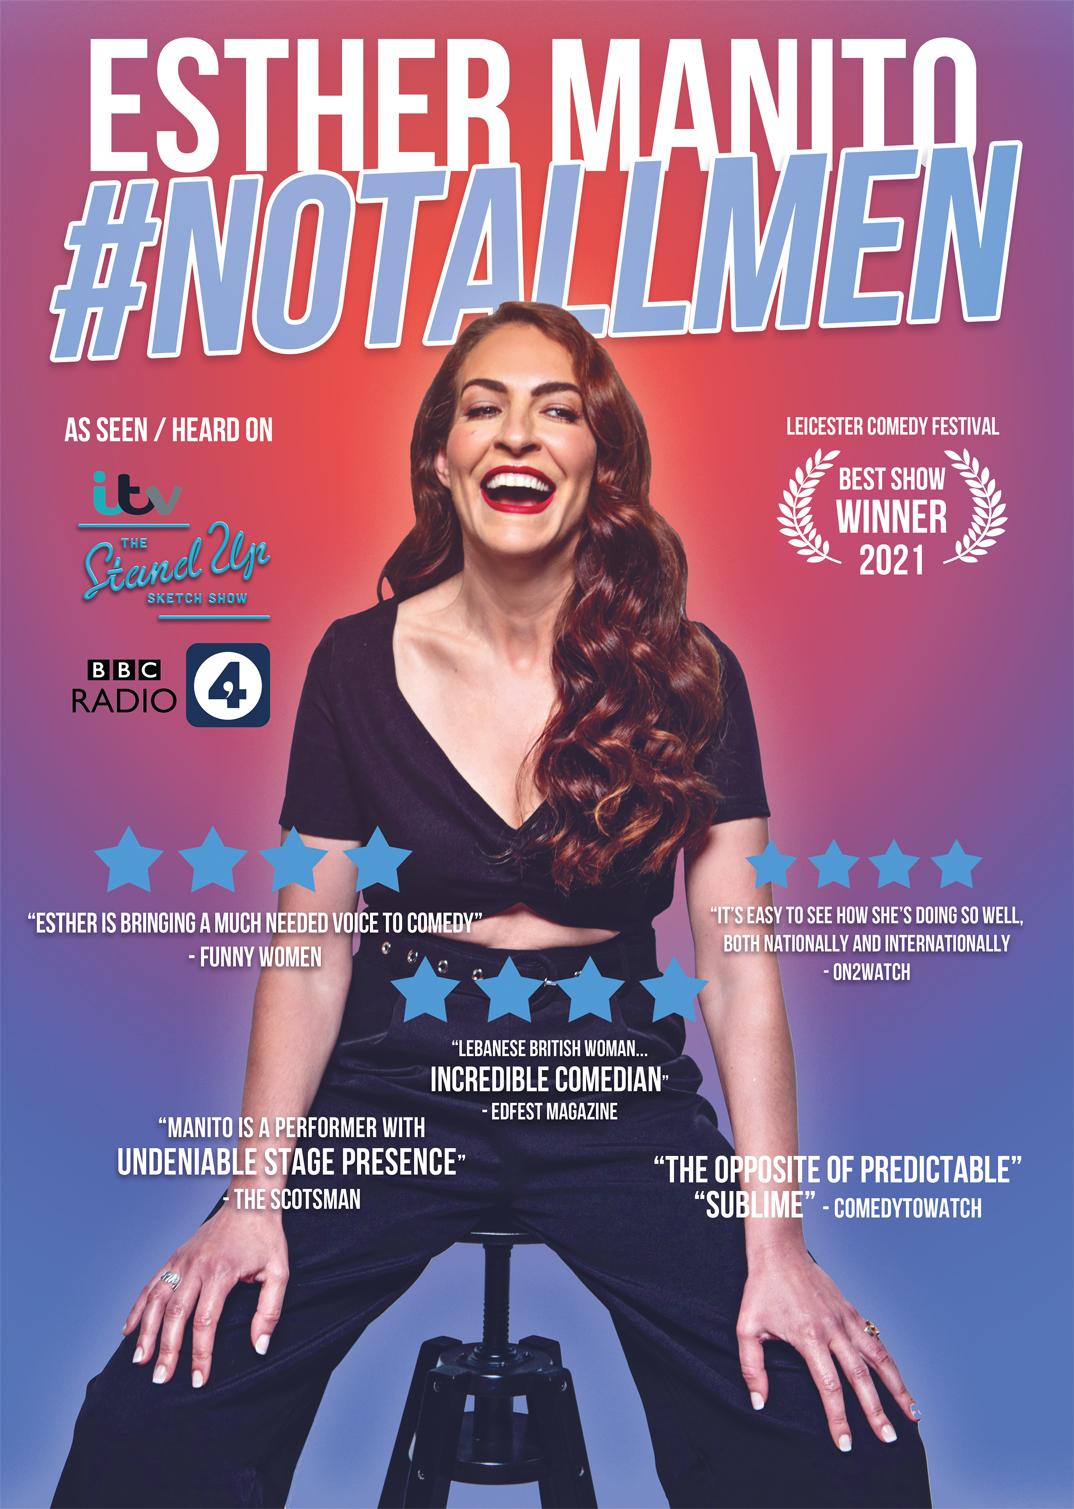 Mini Tour Dates #NotAllMen – Winner of Leicester Comedy Festival Best Show 2021